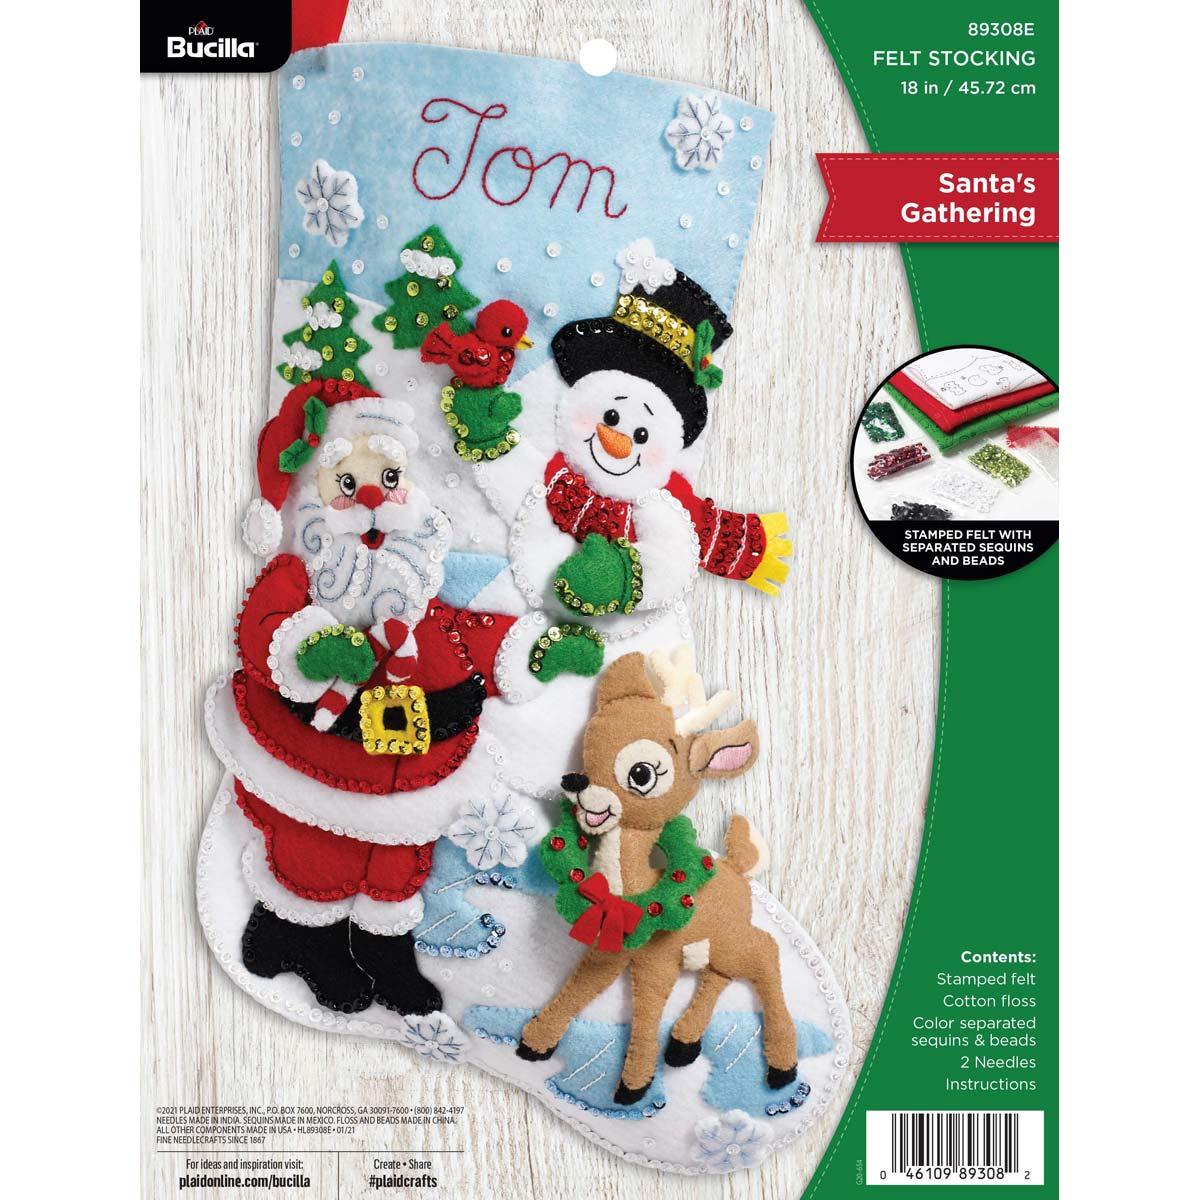 Bucilla ® Seasonal - Felt - Stocking Kits - Santa's Gathering - 89308E